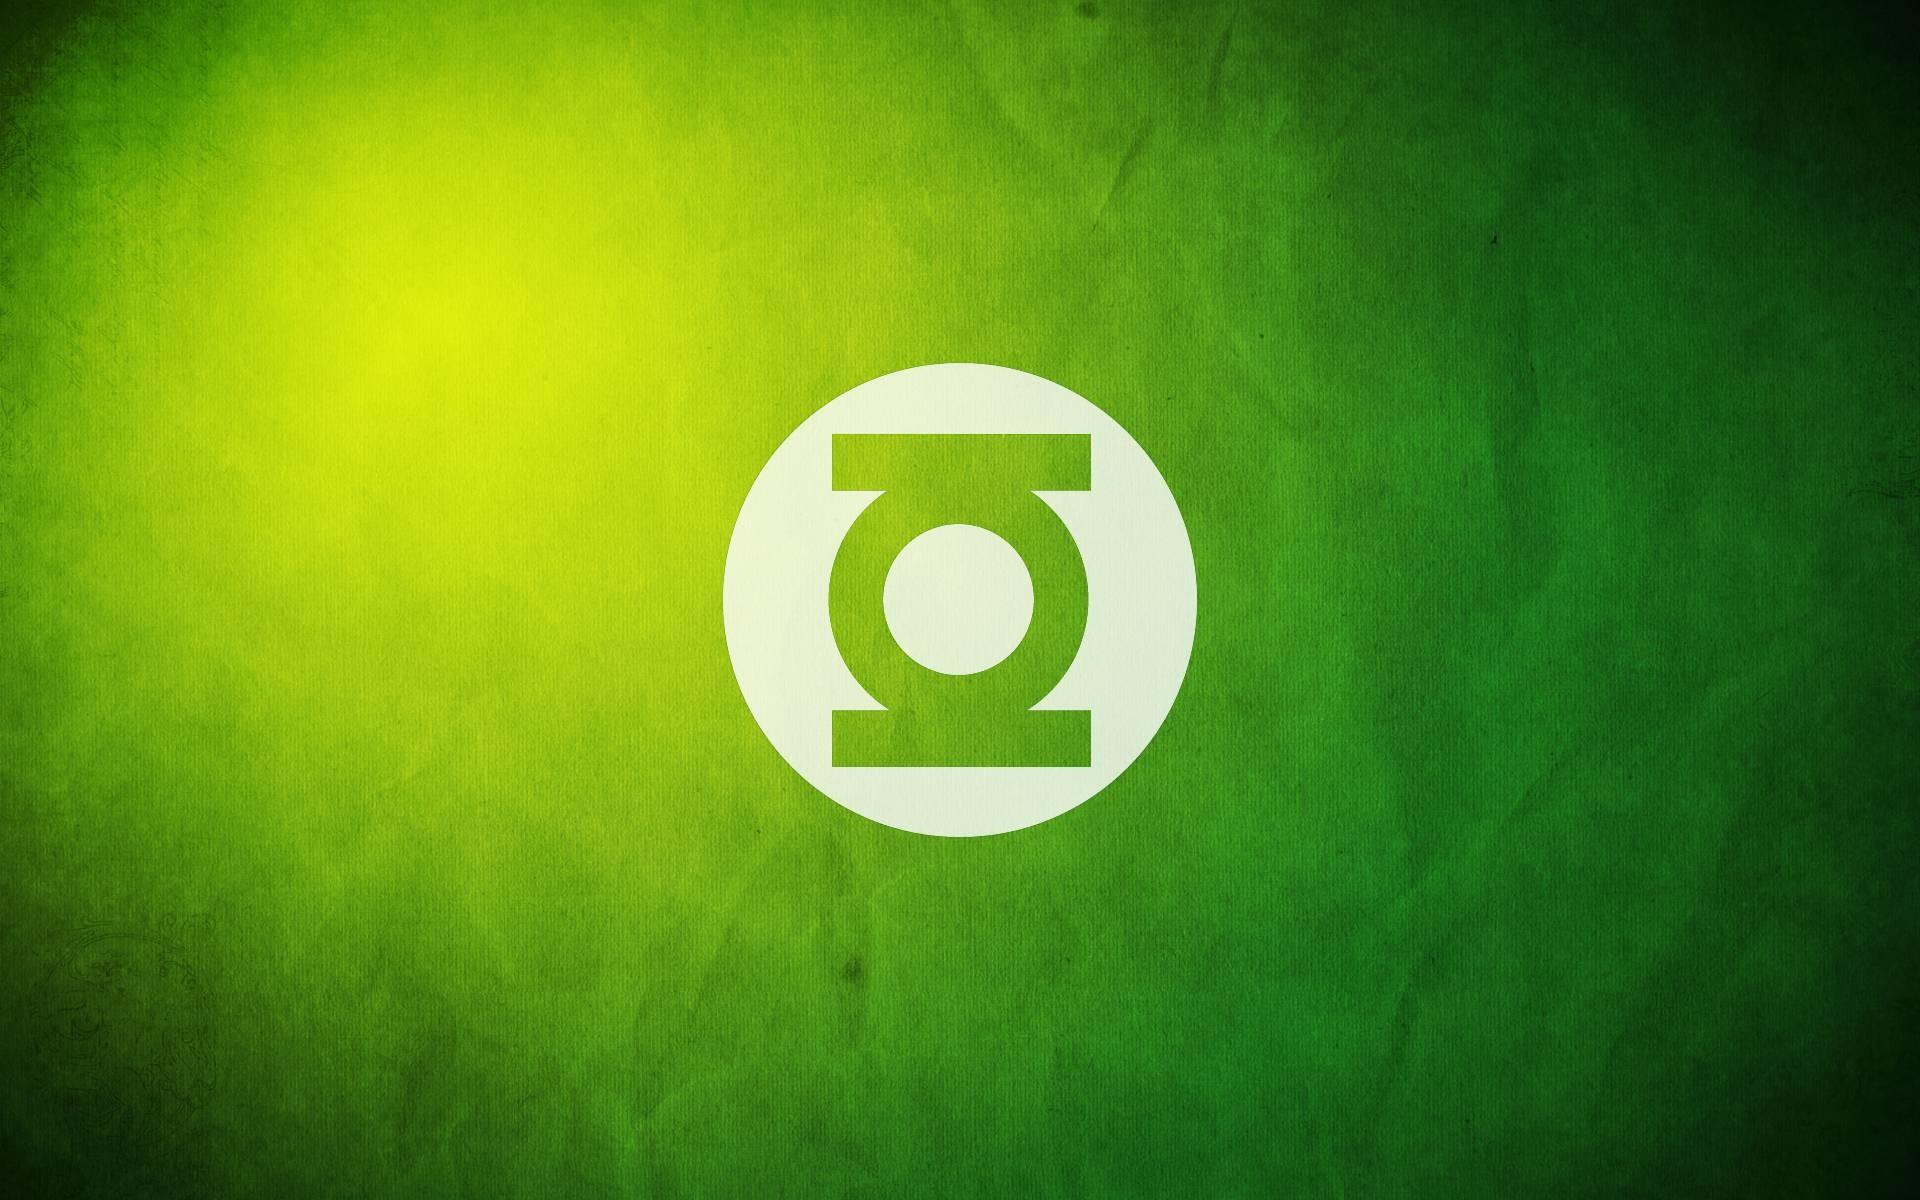 Wallpapers For > Green Lantern Wallpaper